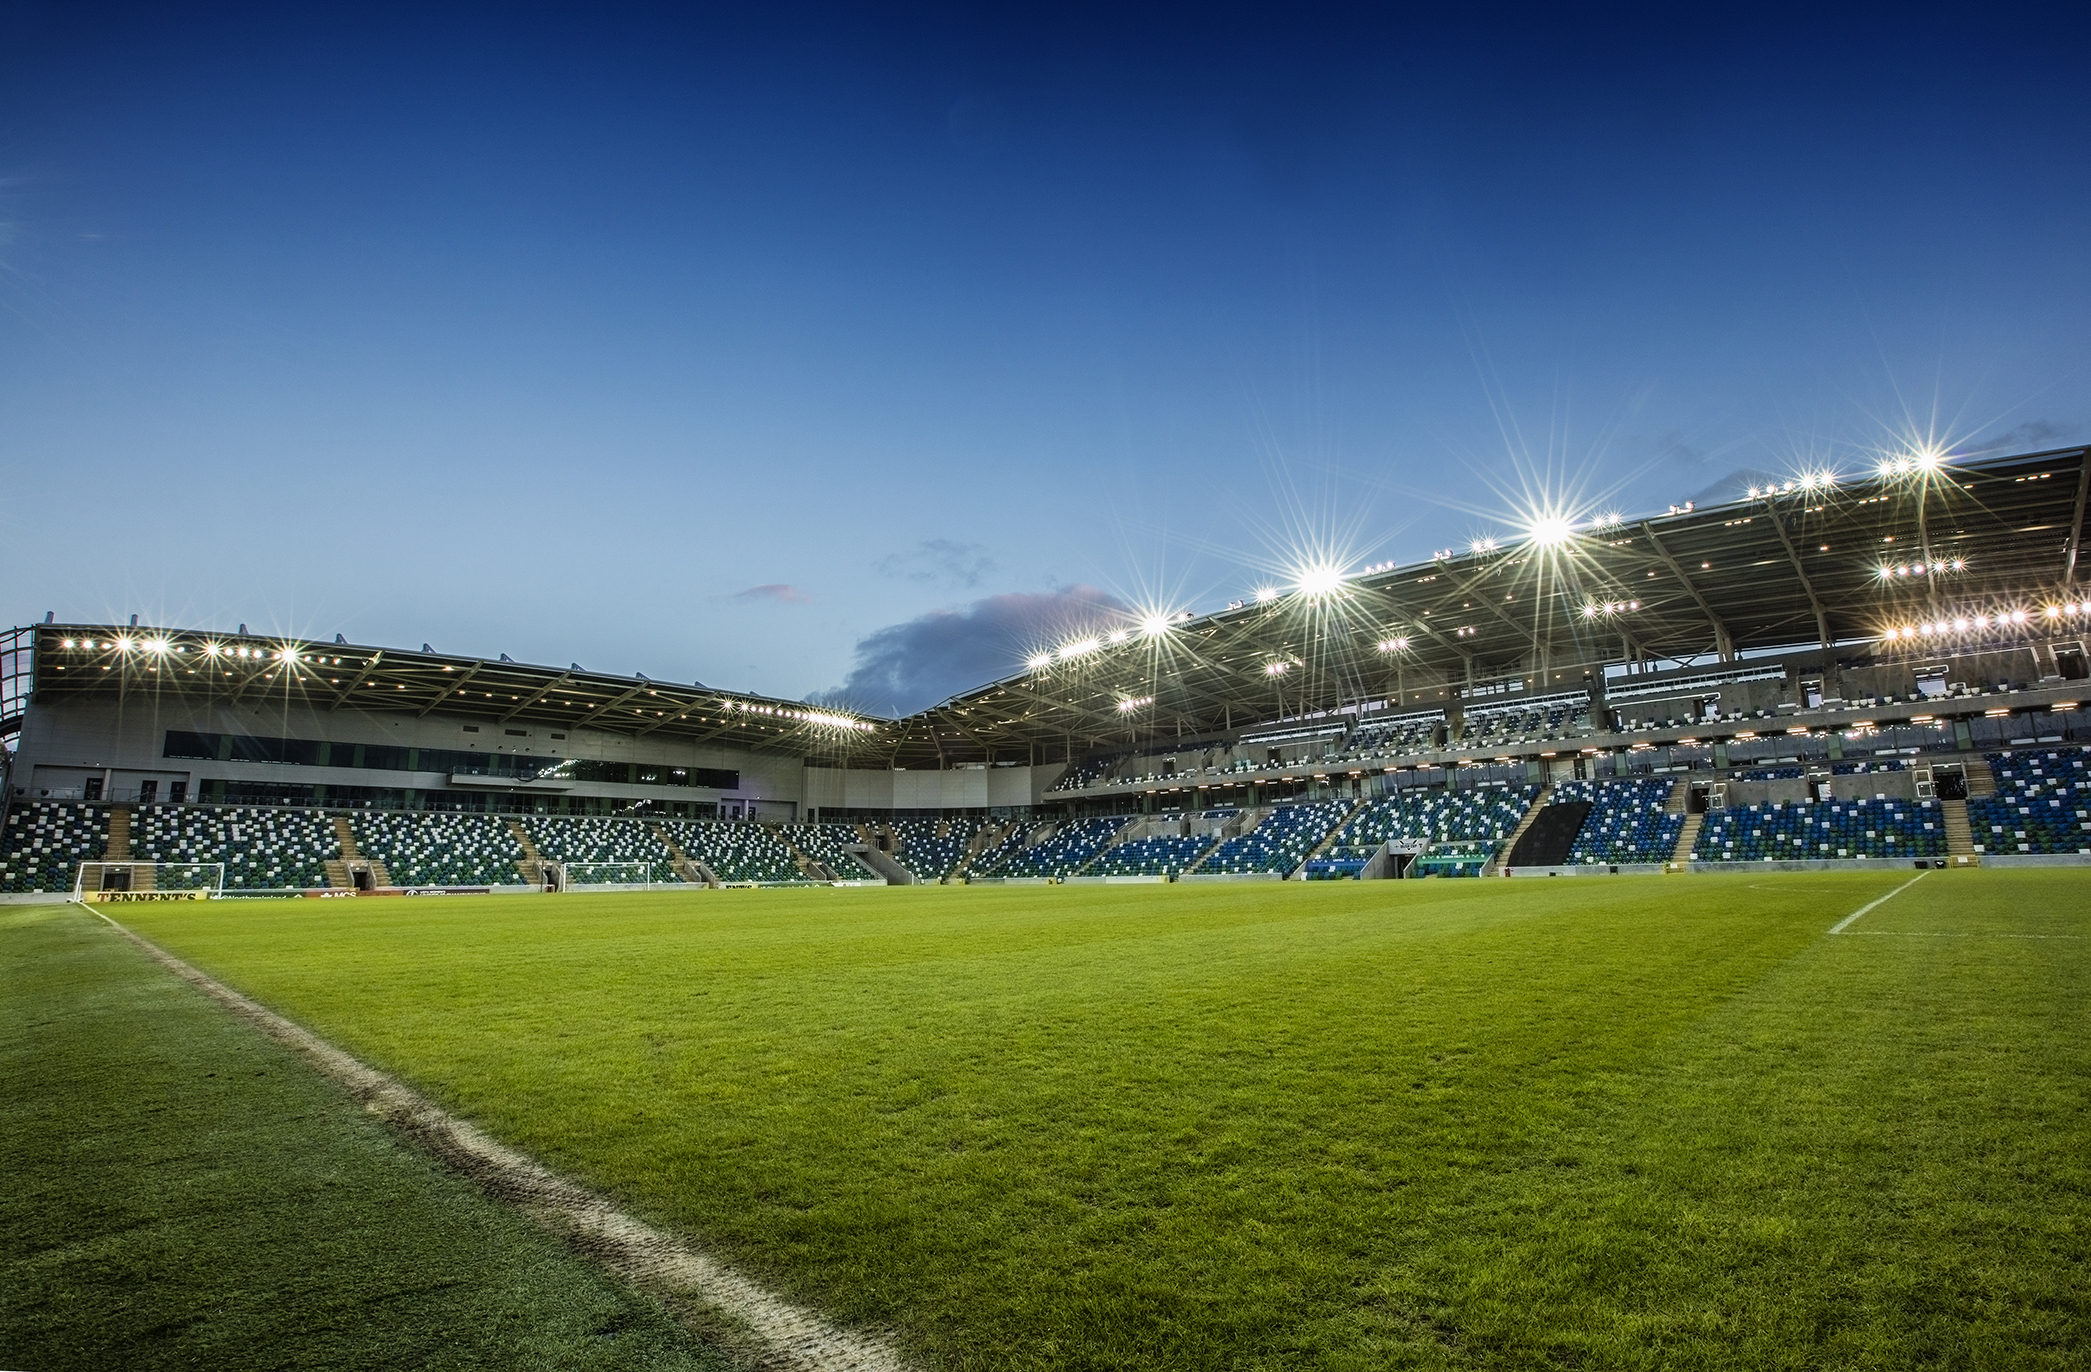 National Football Stadium, Windsor Park